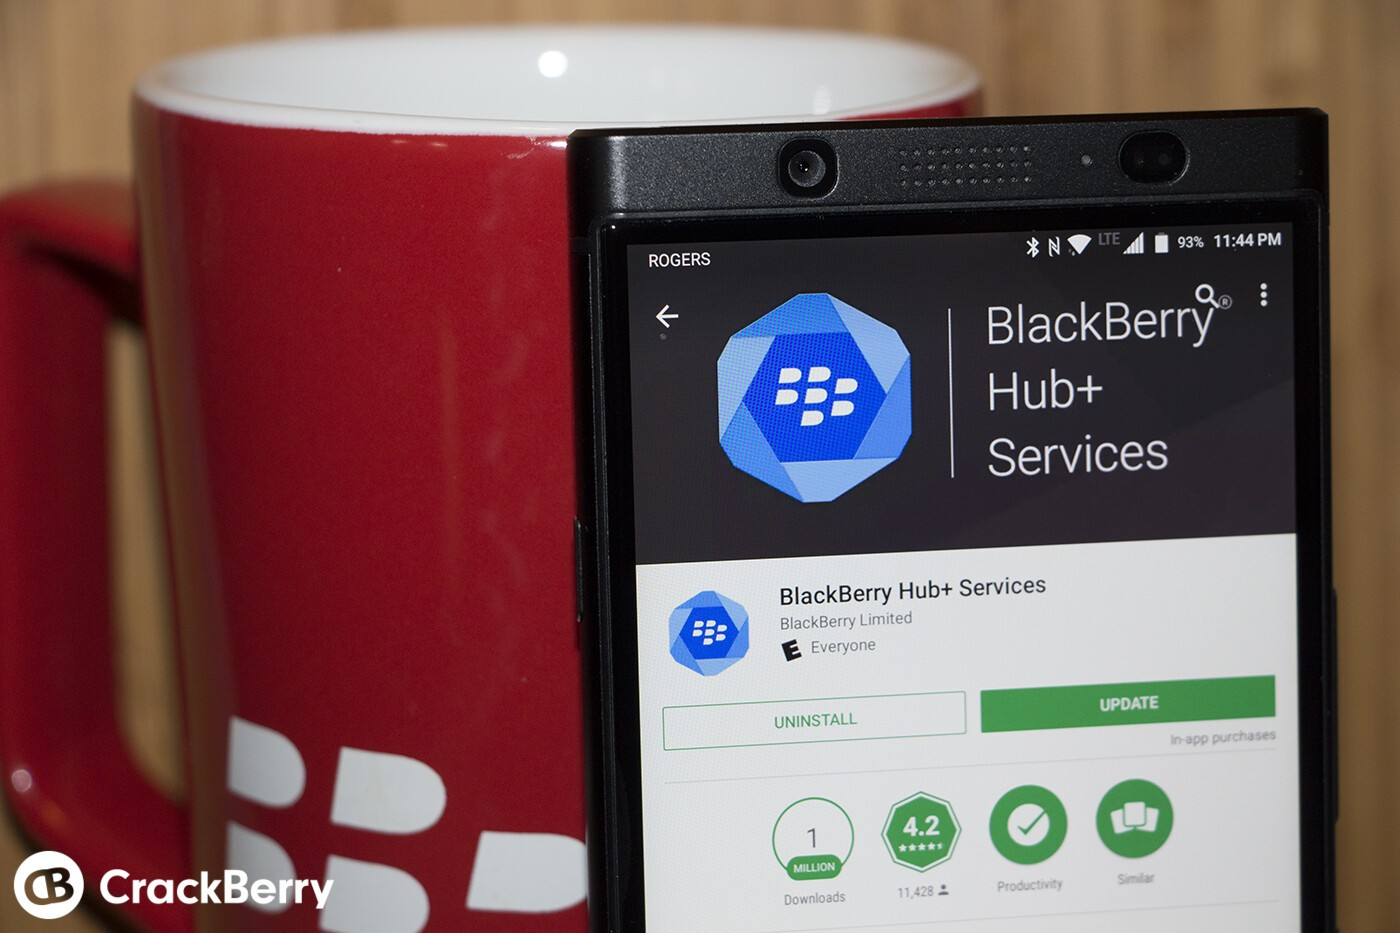 Blackberry news app not updating